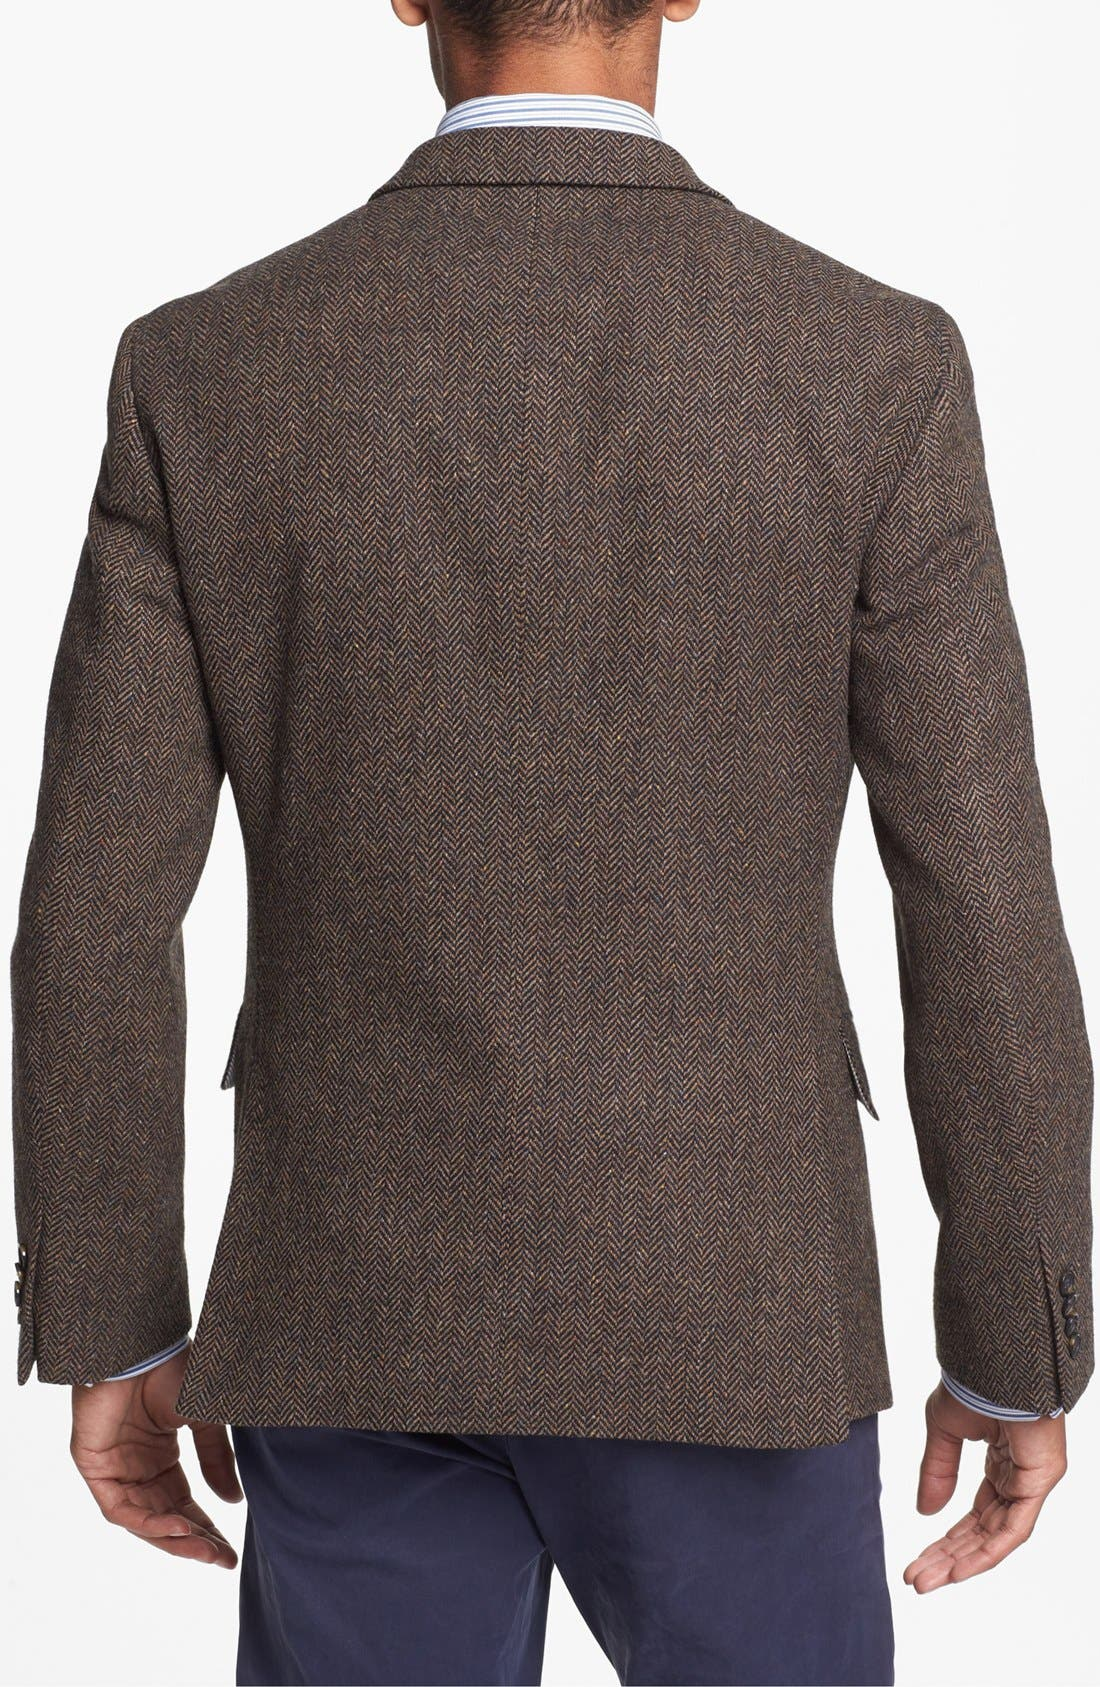 Alternate Image 3  - Wallin & Bros. Extra Trim Fit Herringbone Sportcoat